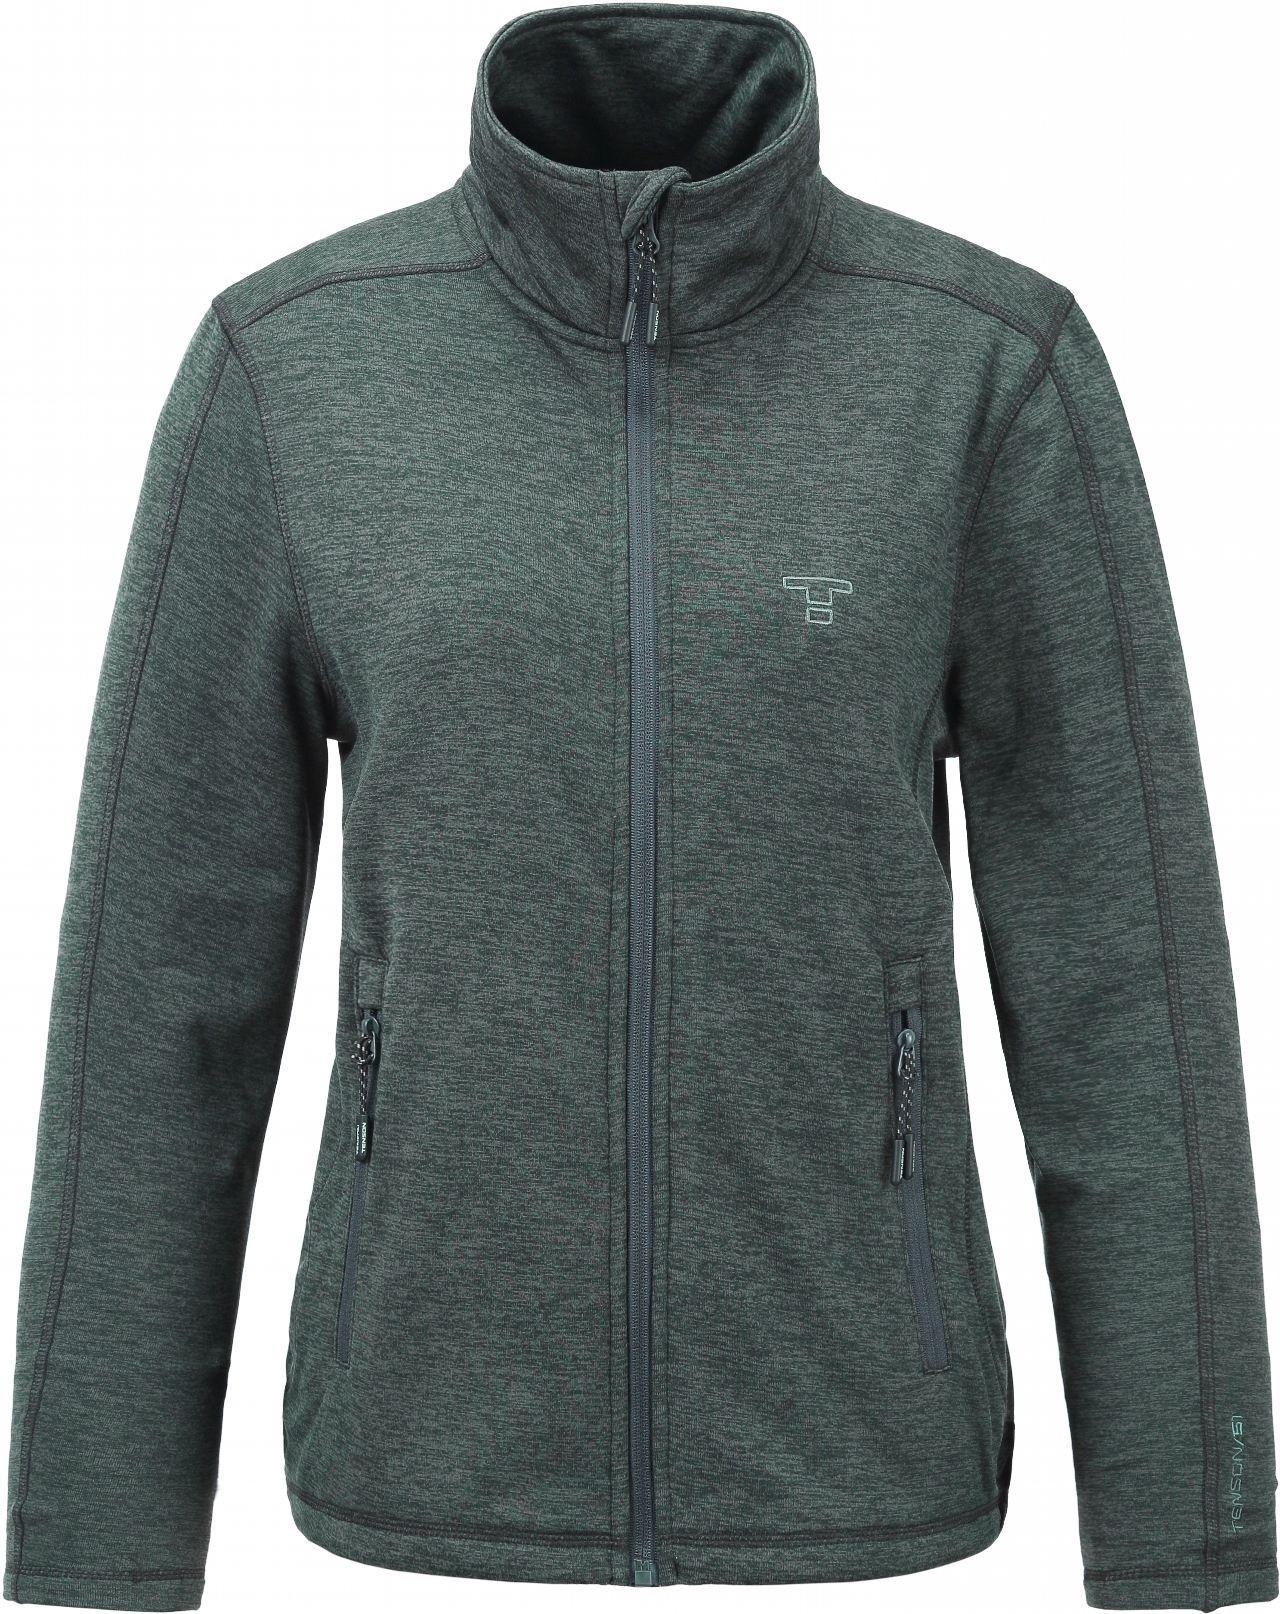 Bluza damska Tenson Lacy Fleece, khaki 36 Khaki